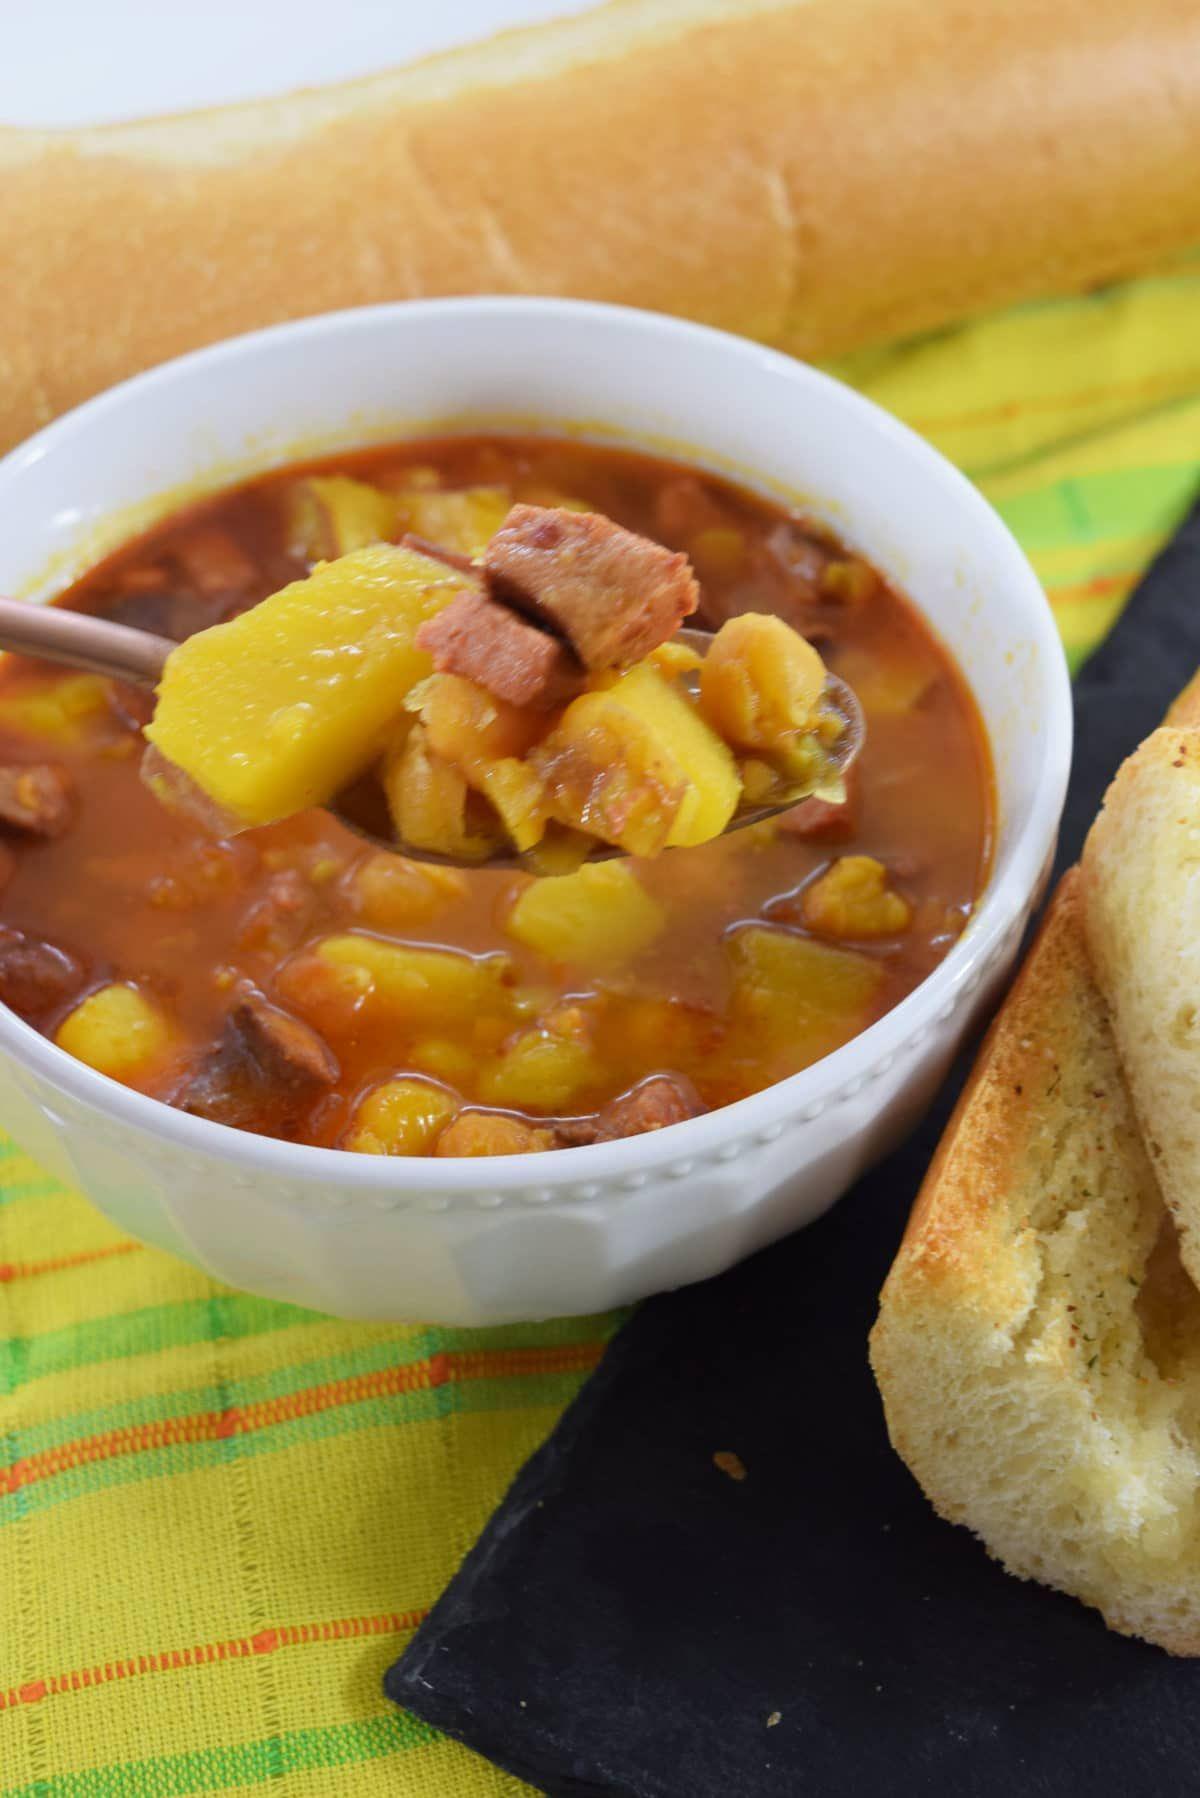 recipe: cuban soup recipes with garbanzo beans [22]